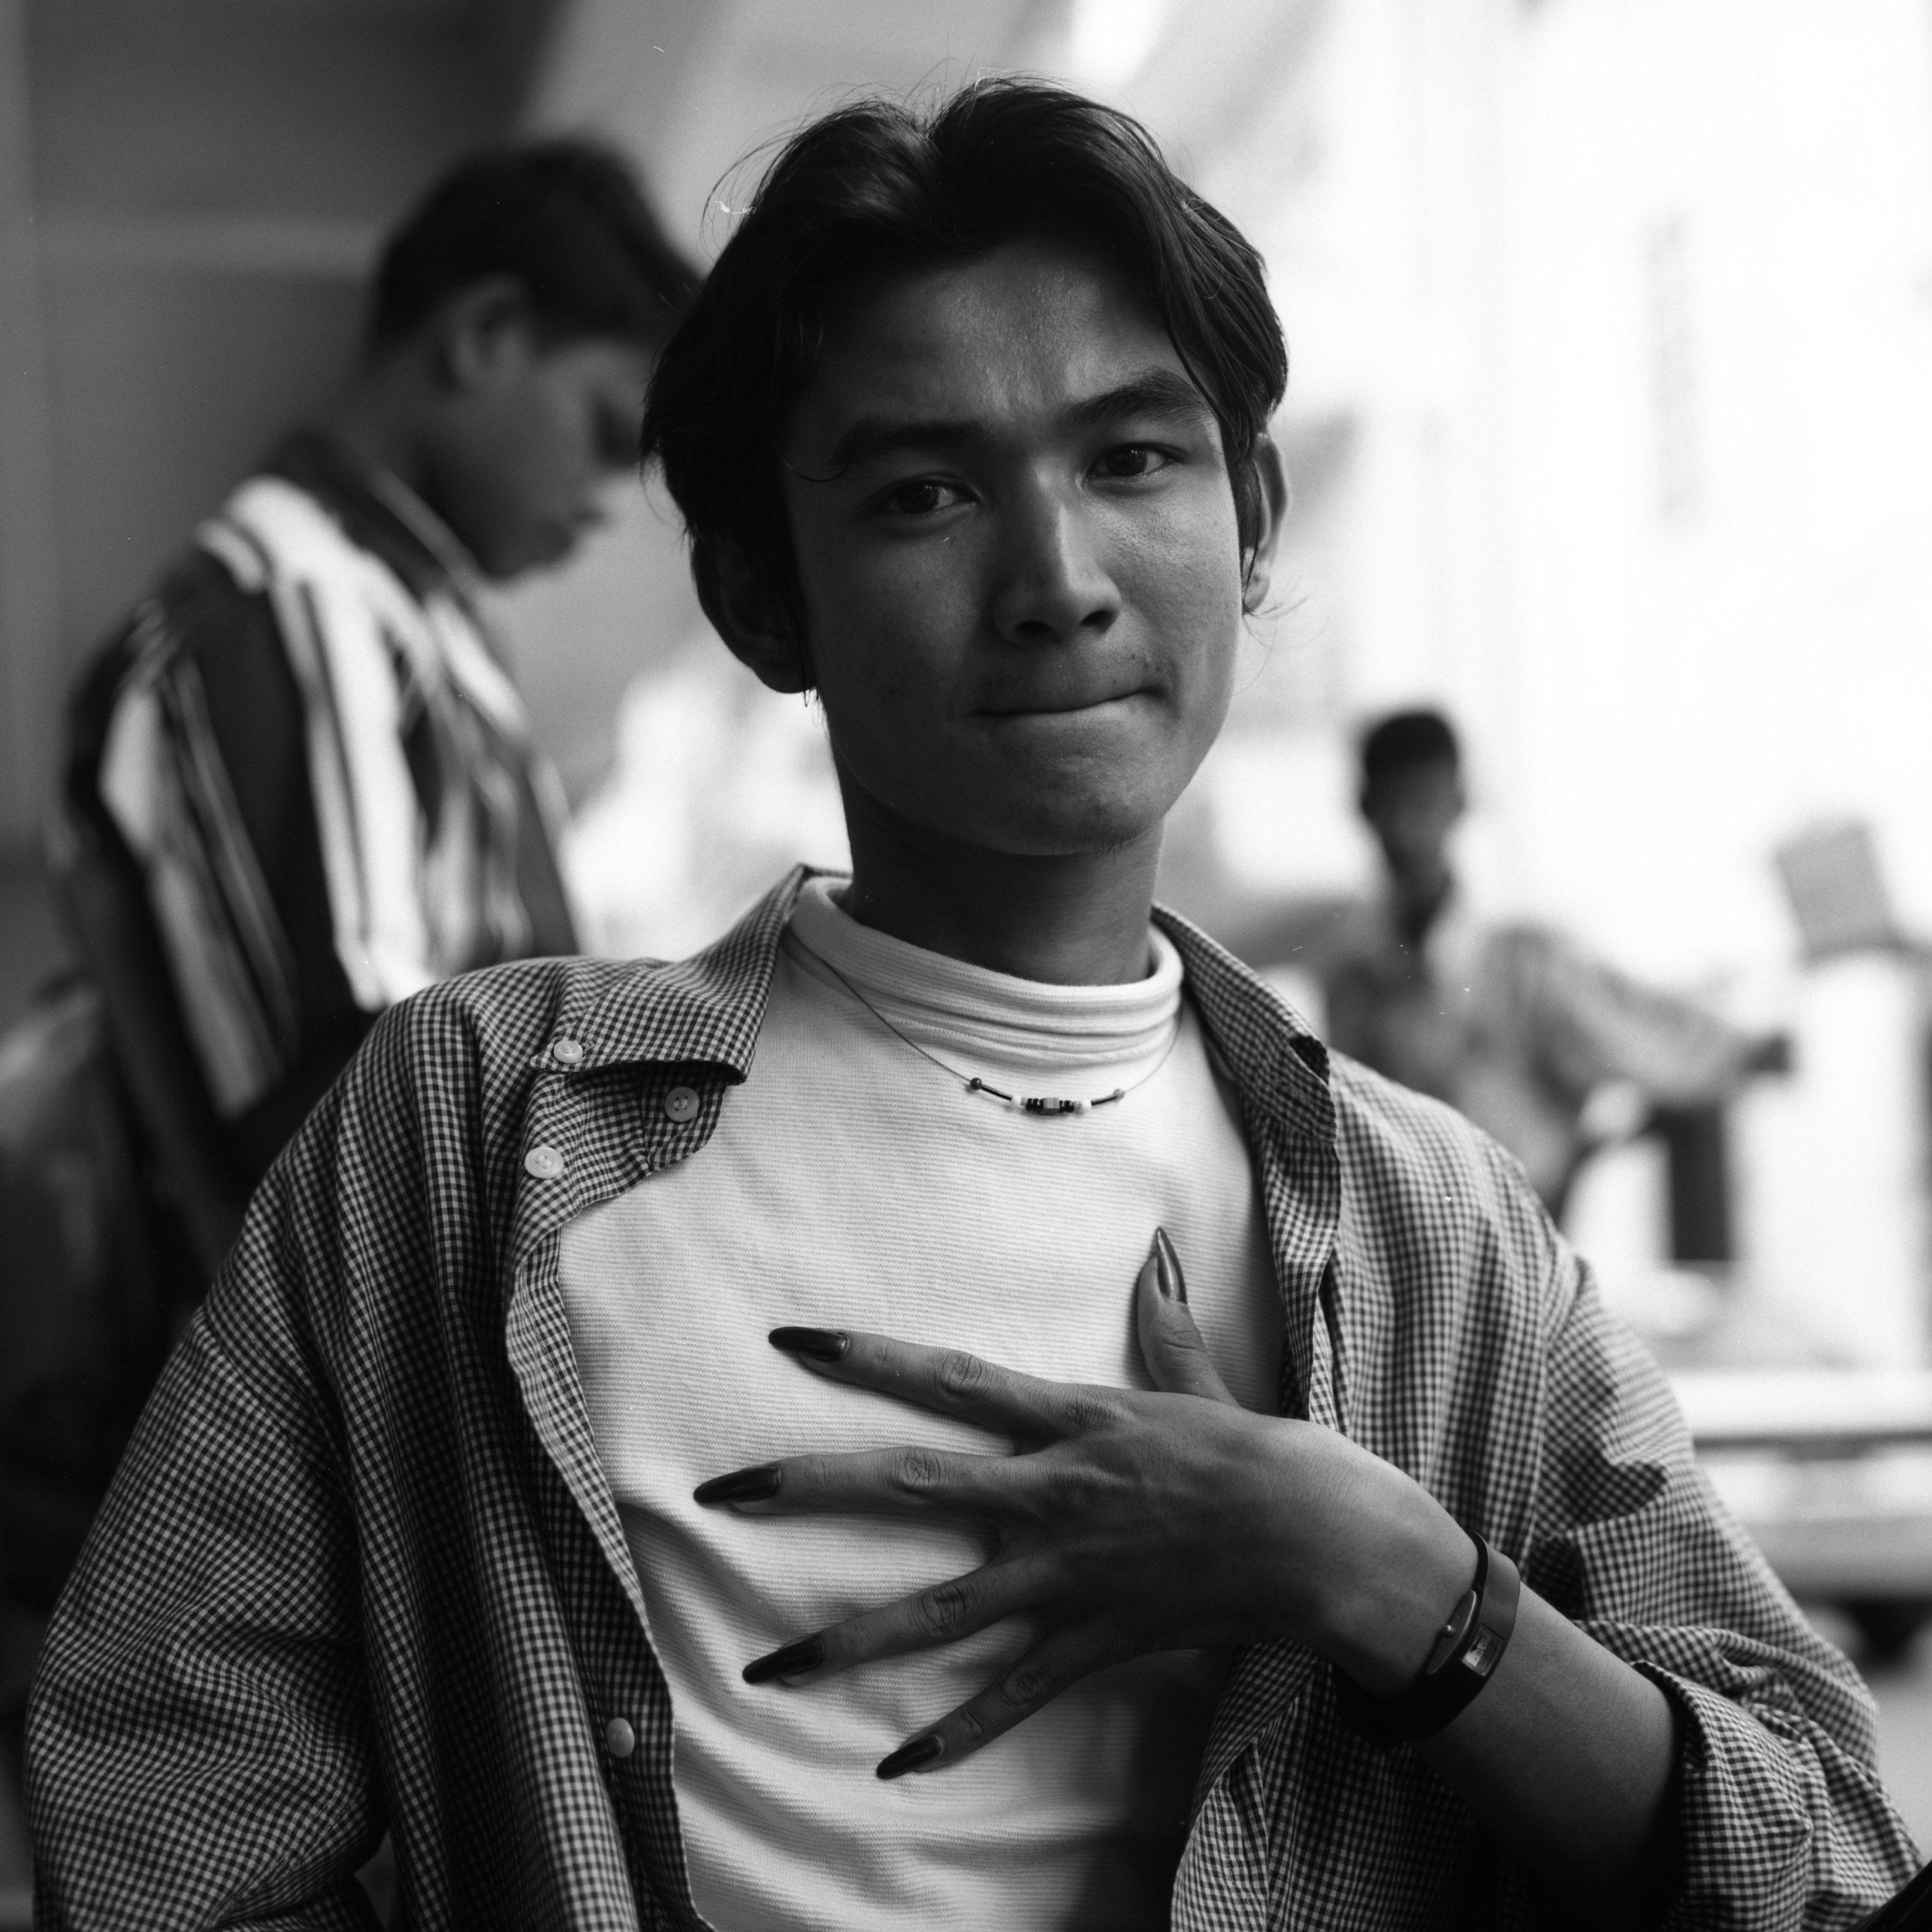 Rangoon Street Portrait #1.jpg